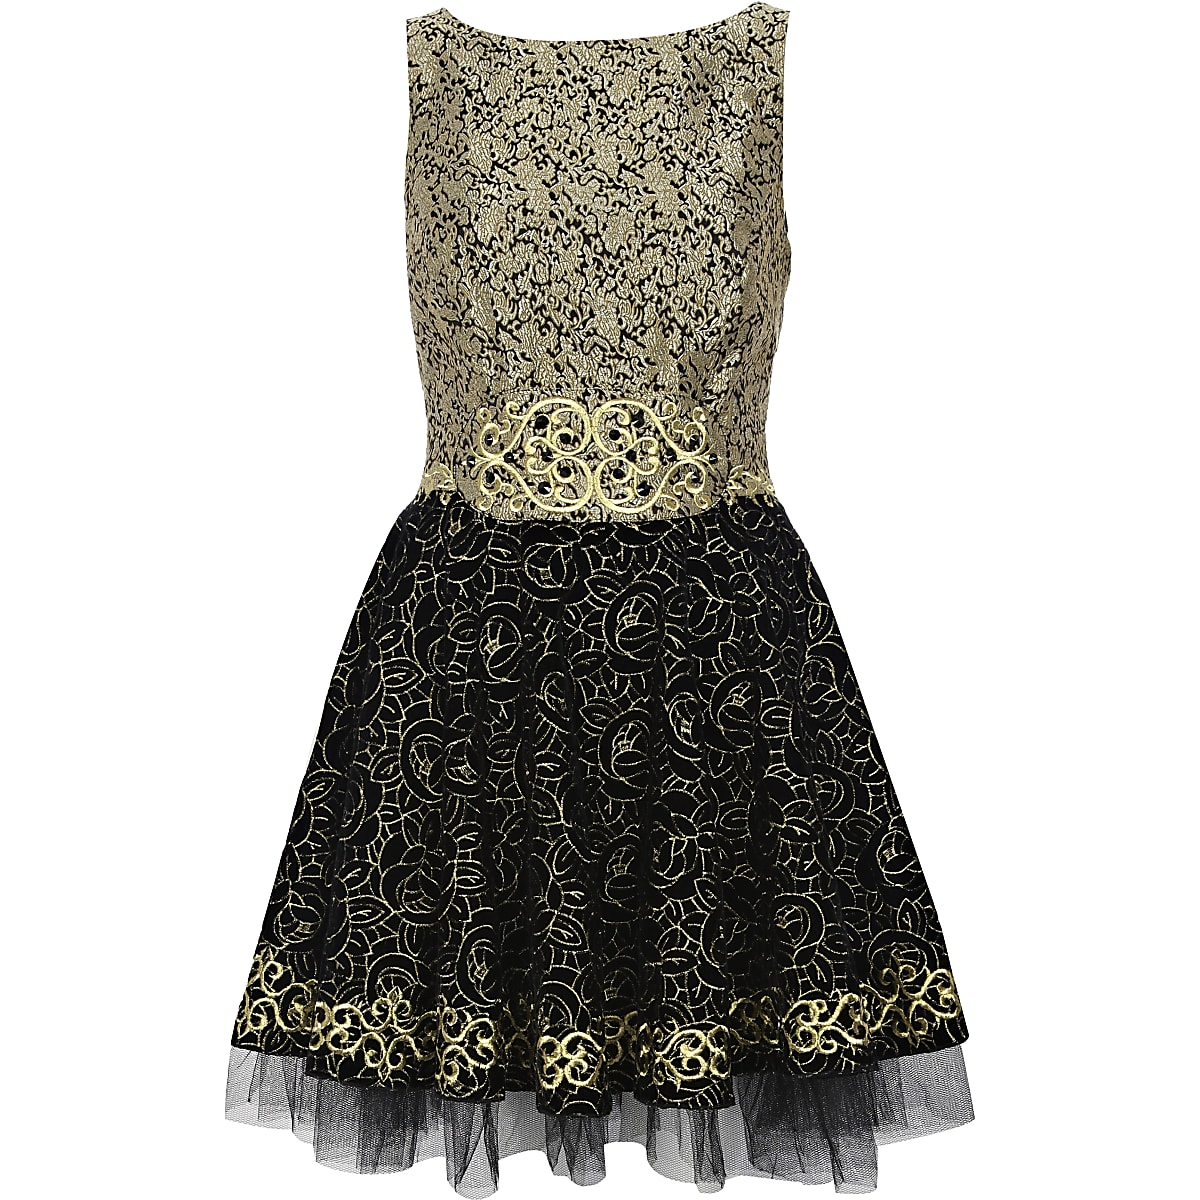 Black metallic baroque prom dress